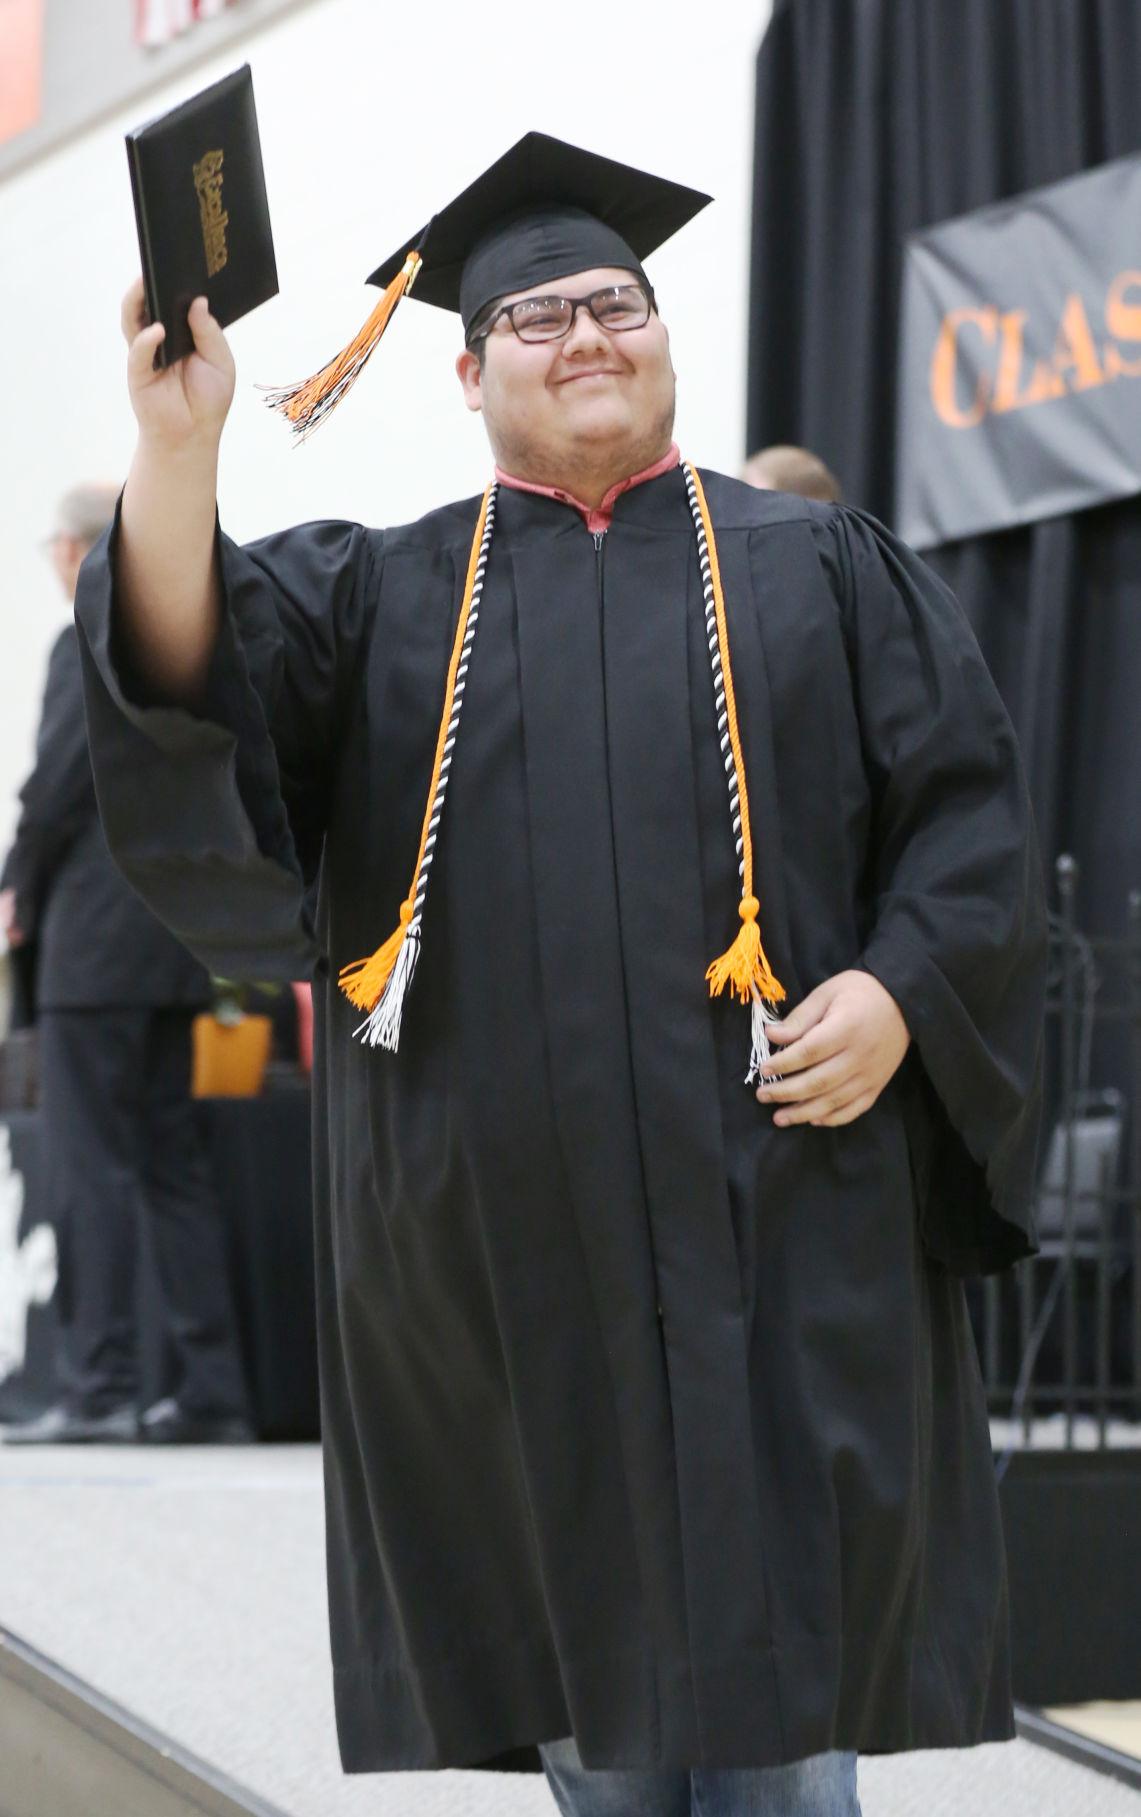 2019 HHS grad 1